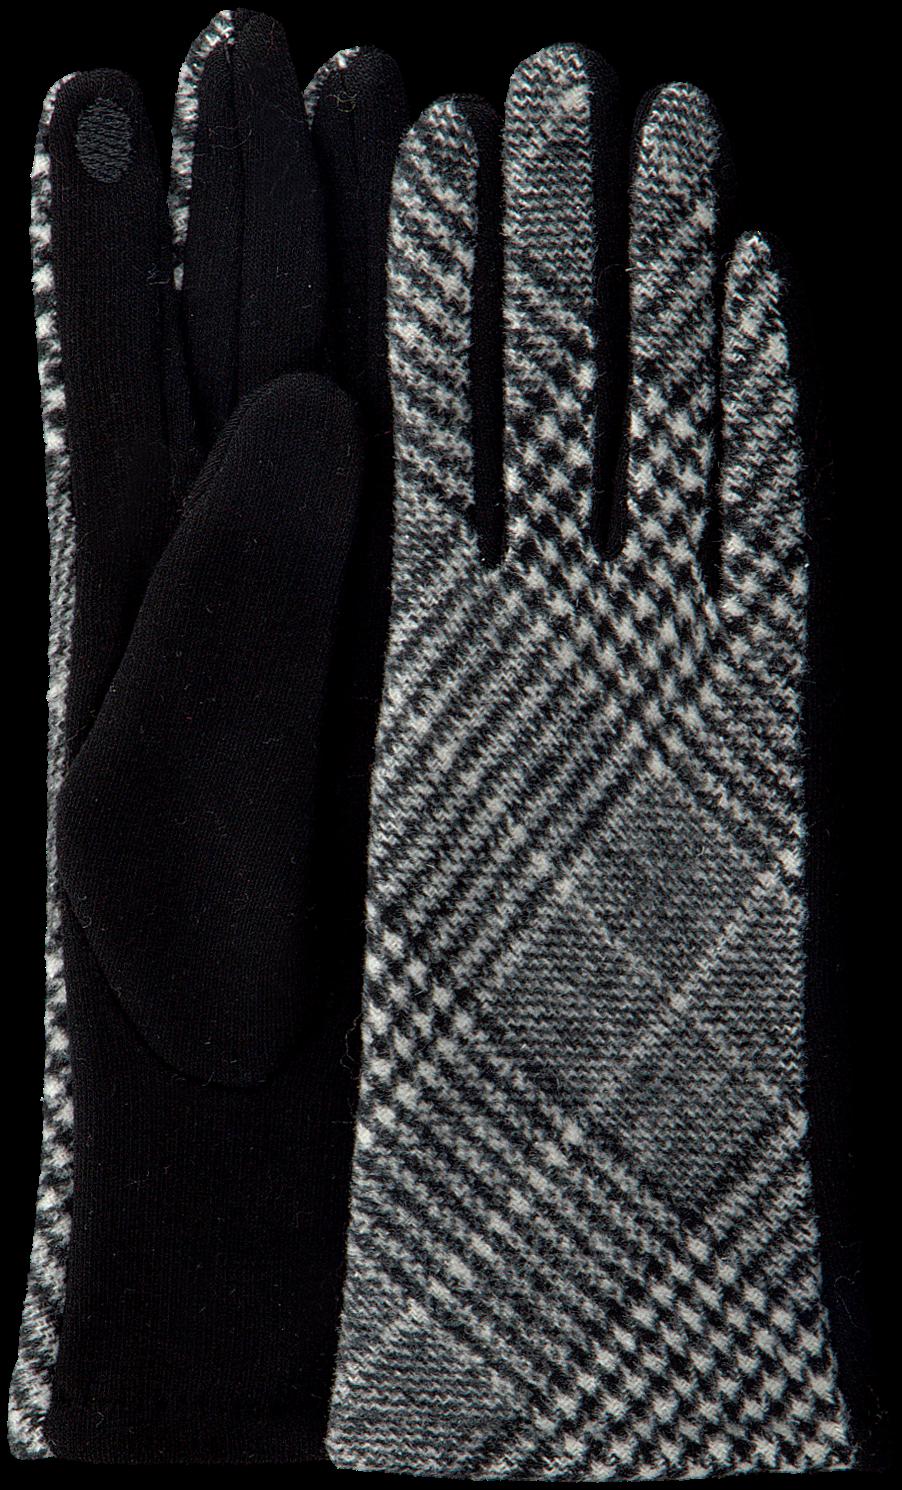 Schwarze ABOUT ACCESSORIES Handschuhe 384.37.304.0 lGyoC